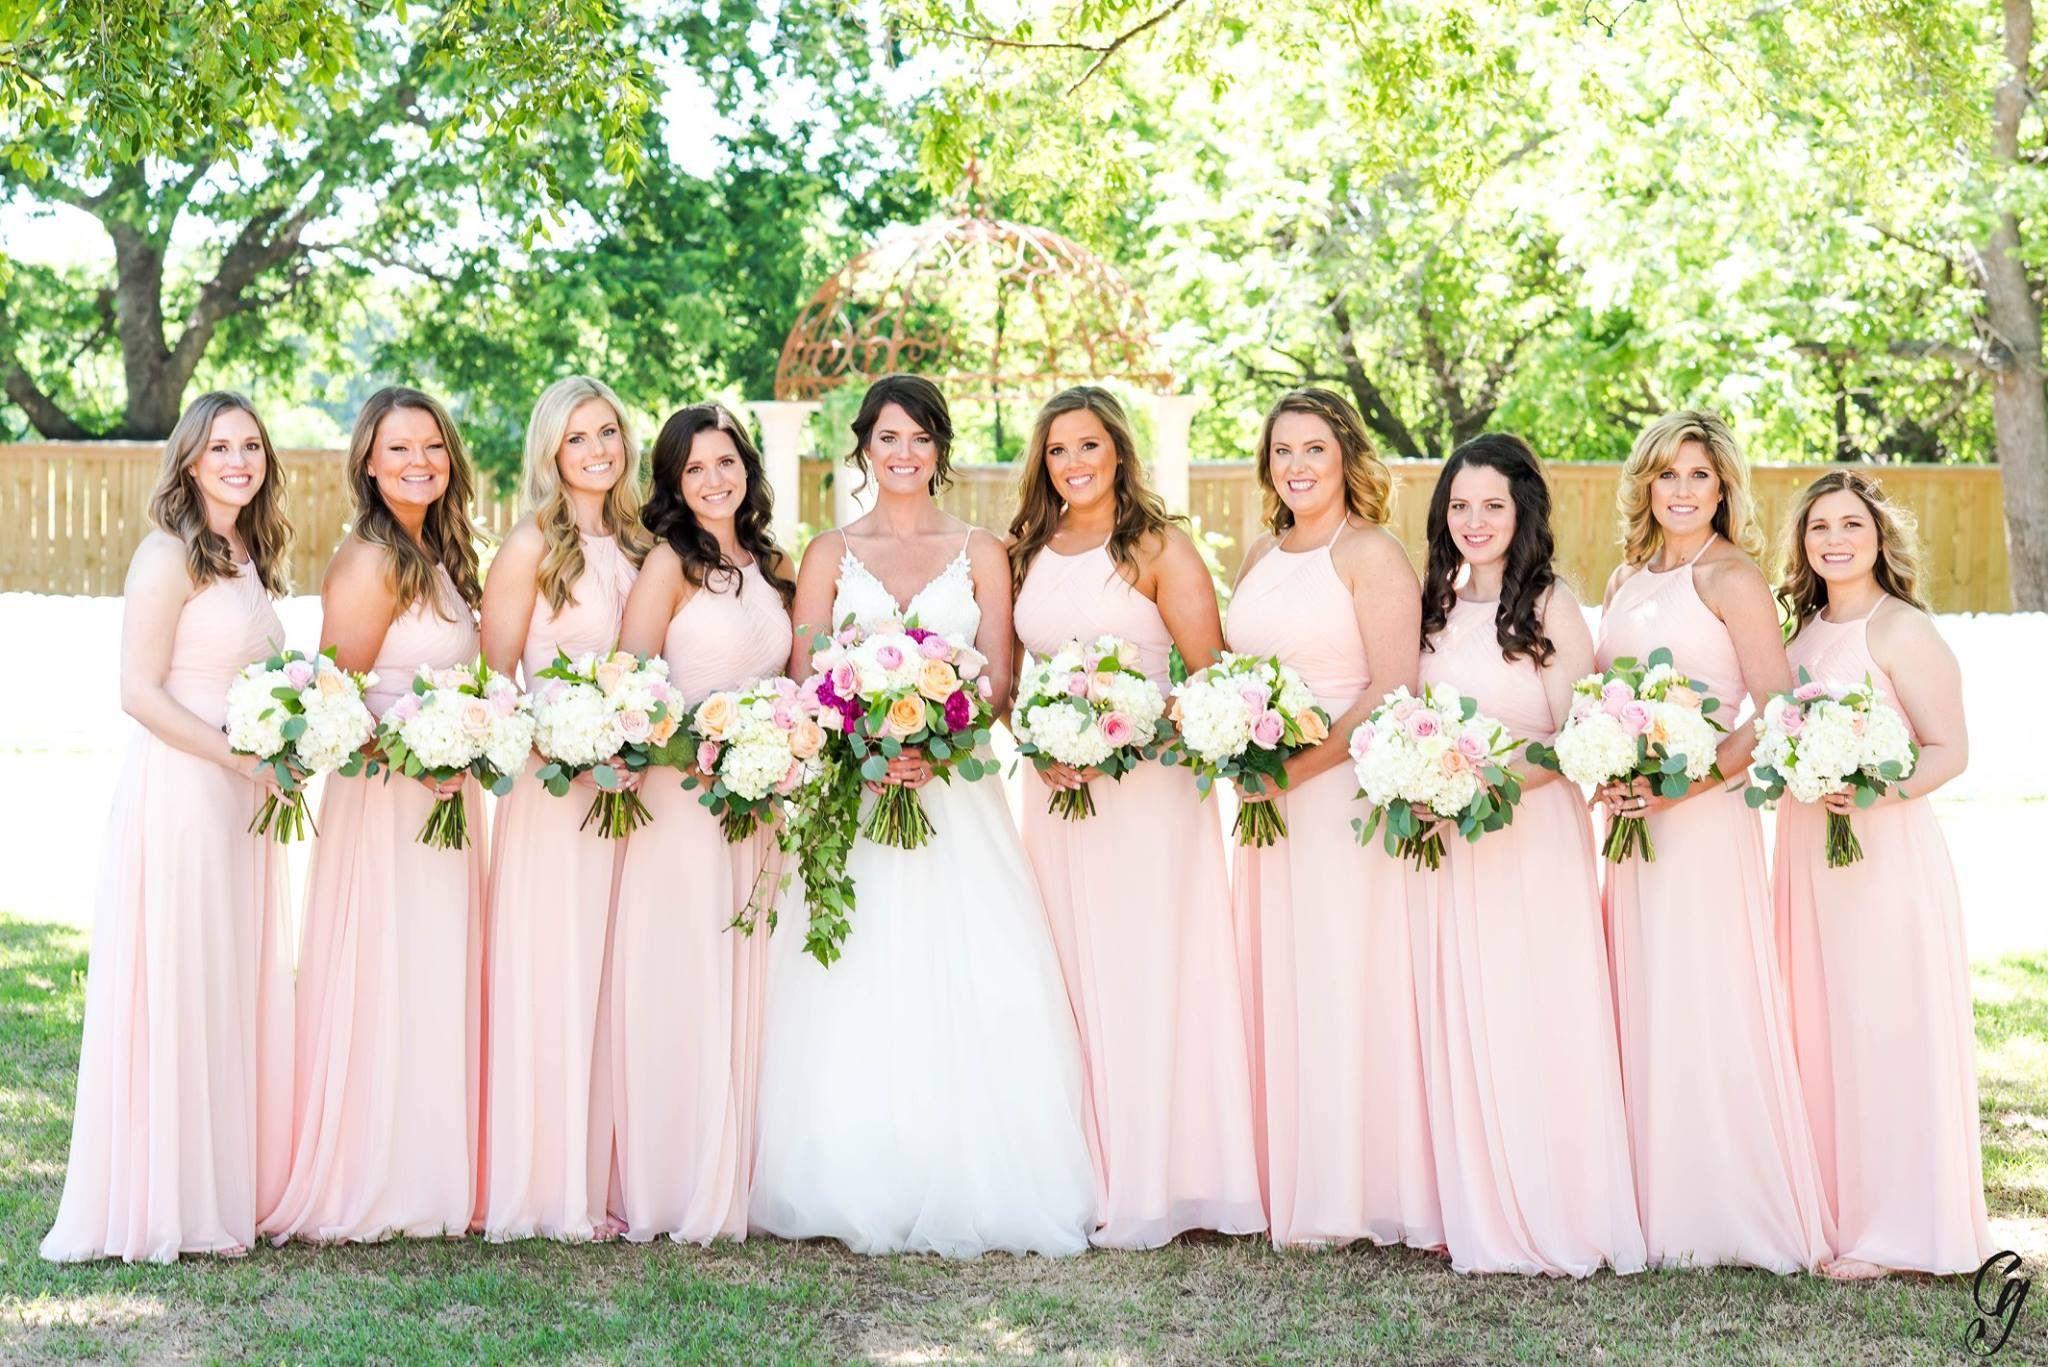 05bedbf3 Ginger in 2019 | Matt & Kaitlyn. | Bridesmaid dresses, Peach bridesmaid  dresses, Azazie bridesmaid dresses